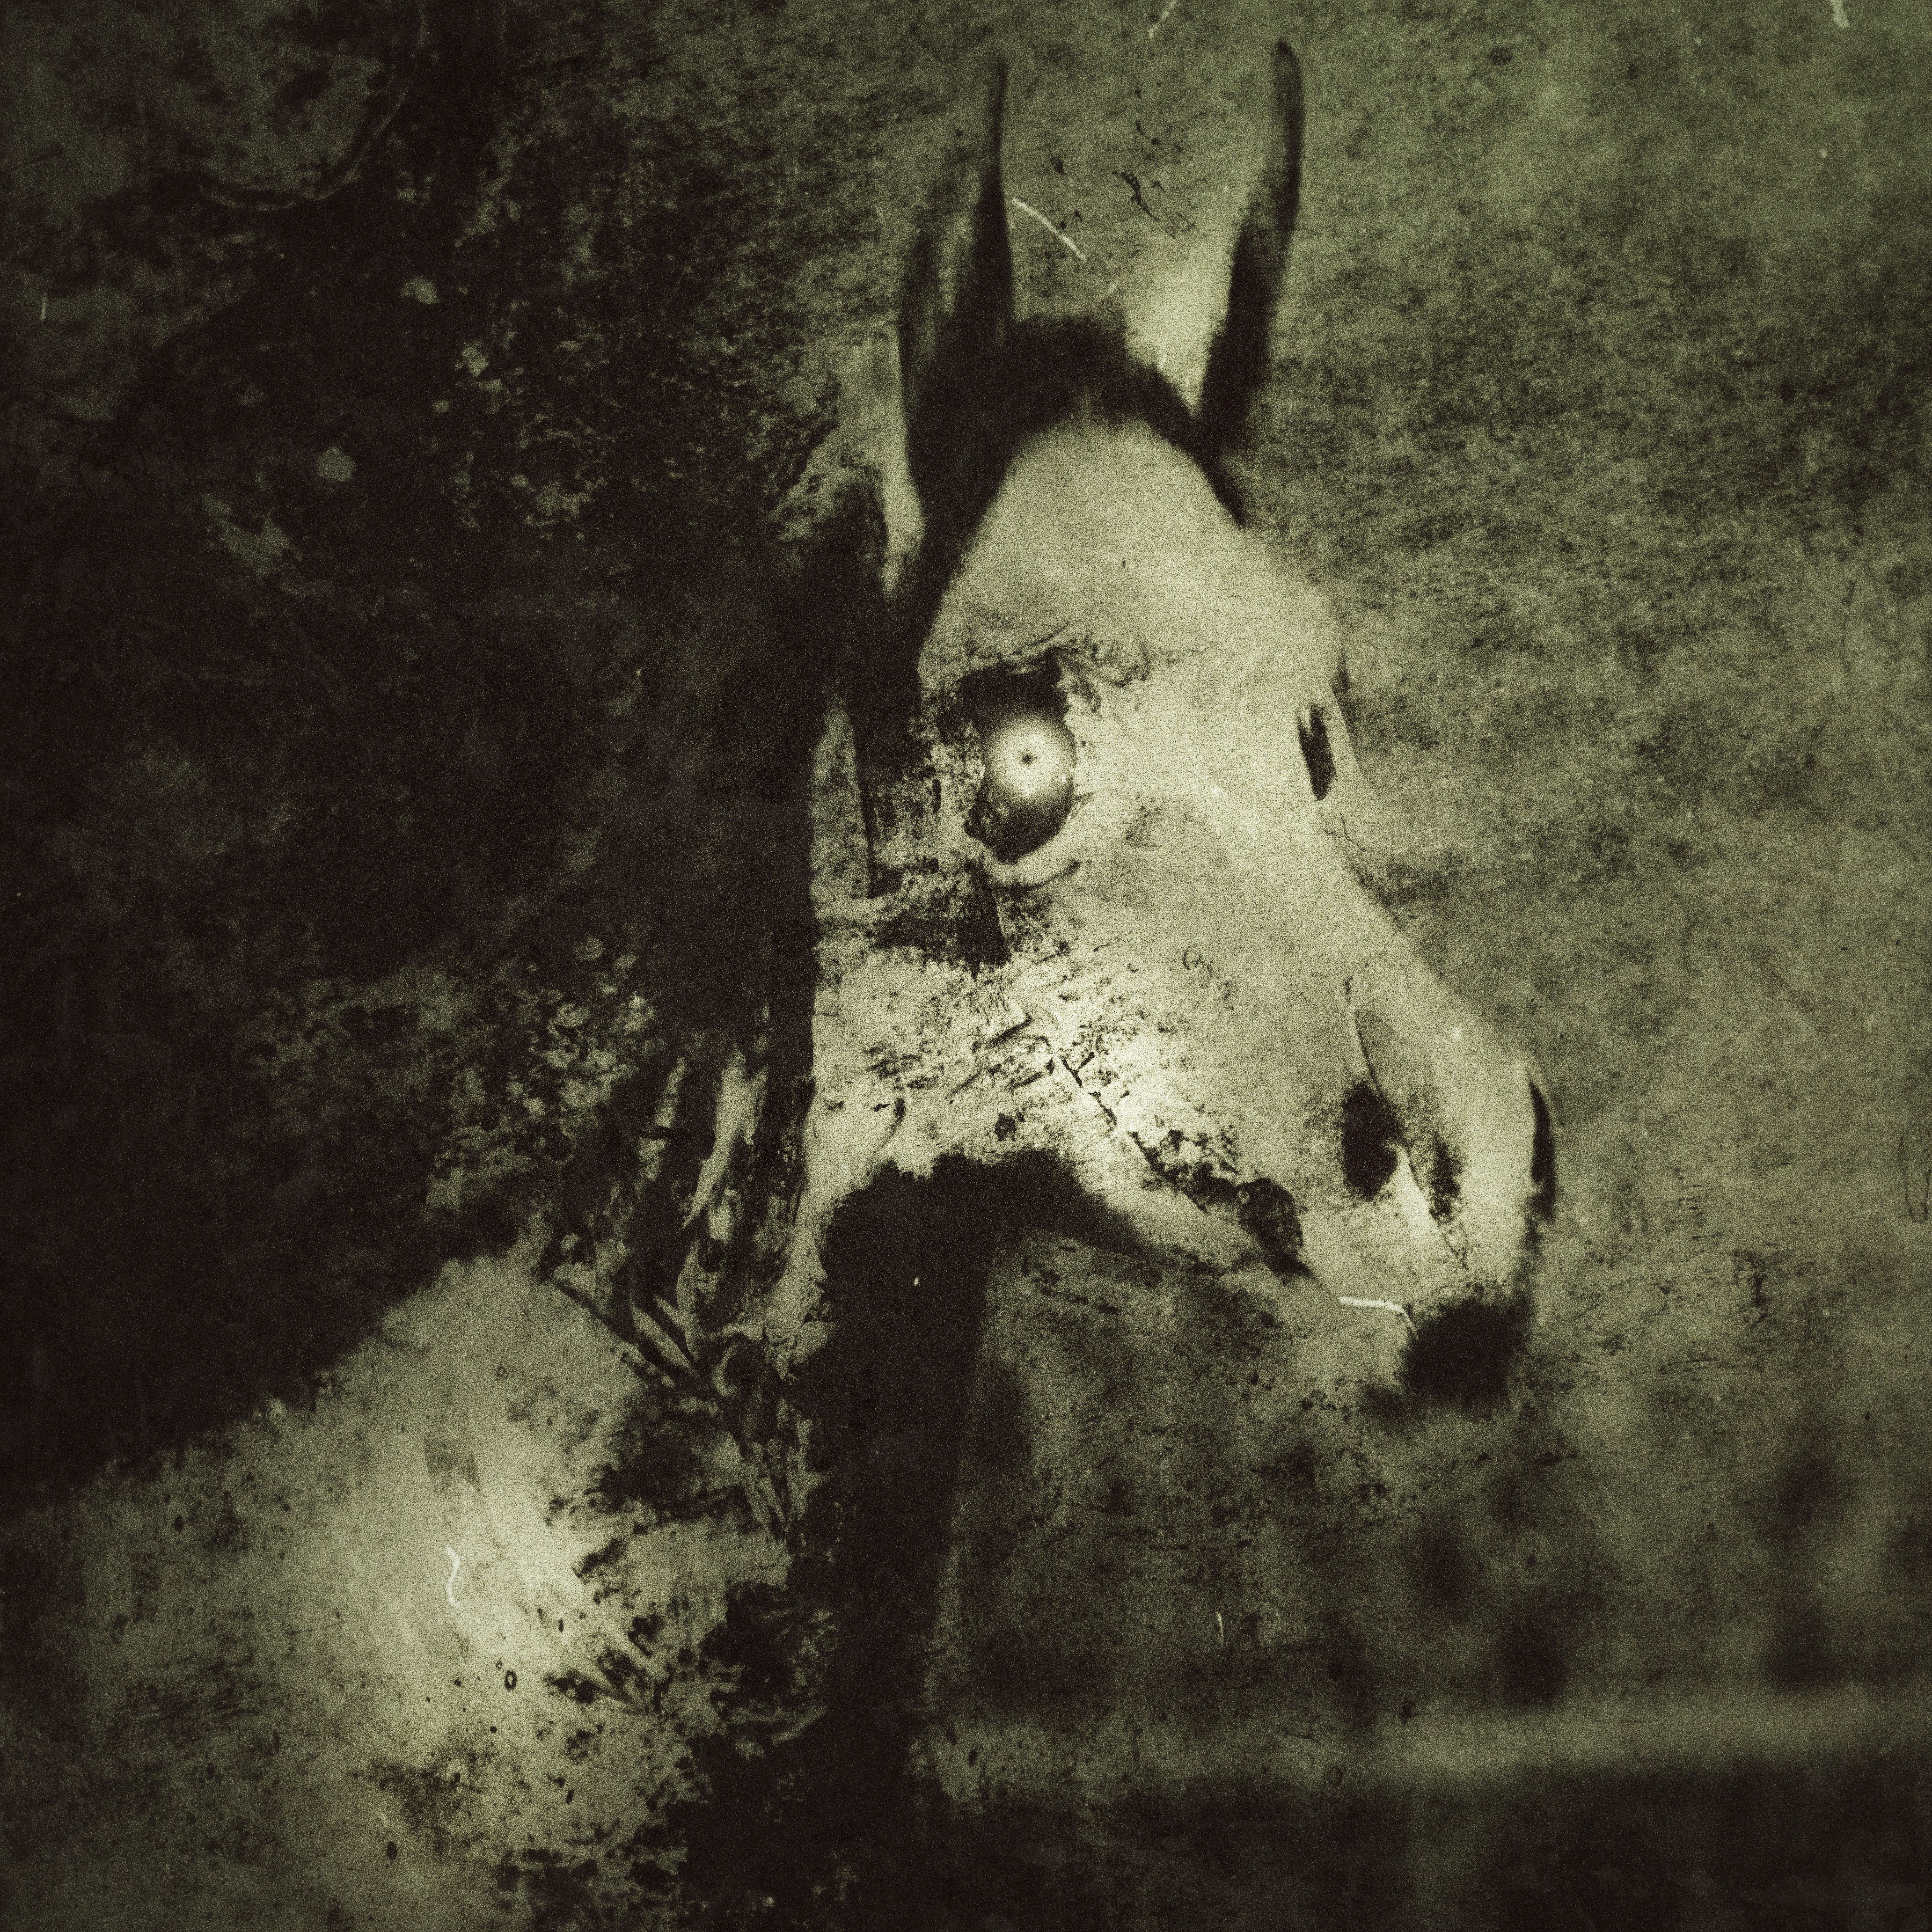 La Segua | New Monster for Fifth Edition